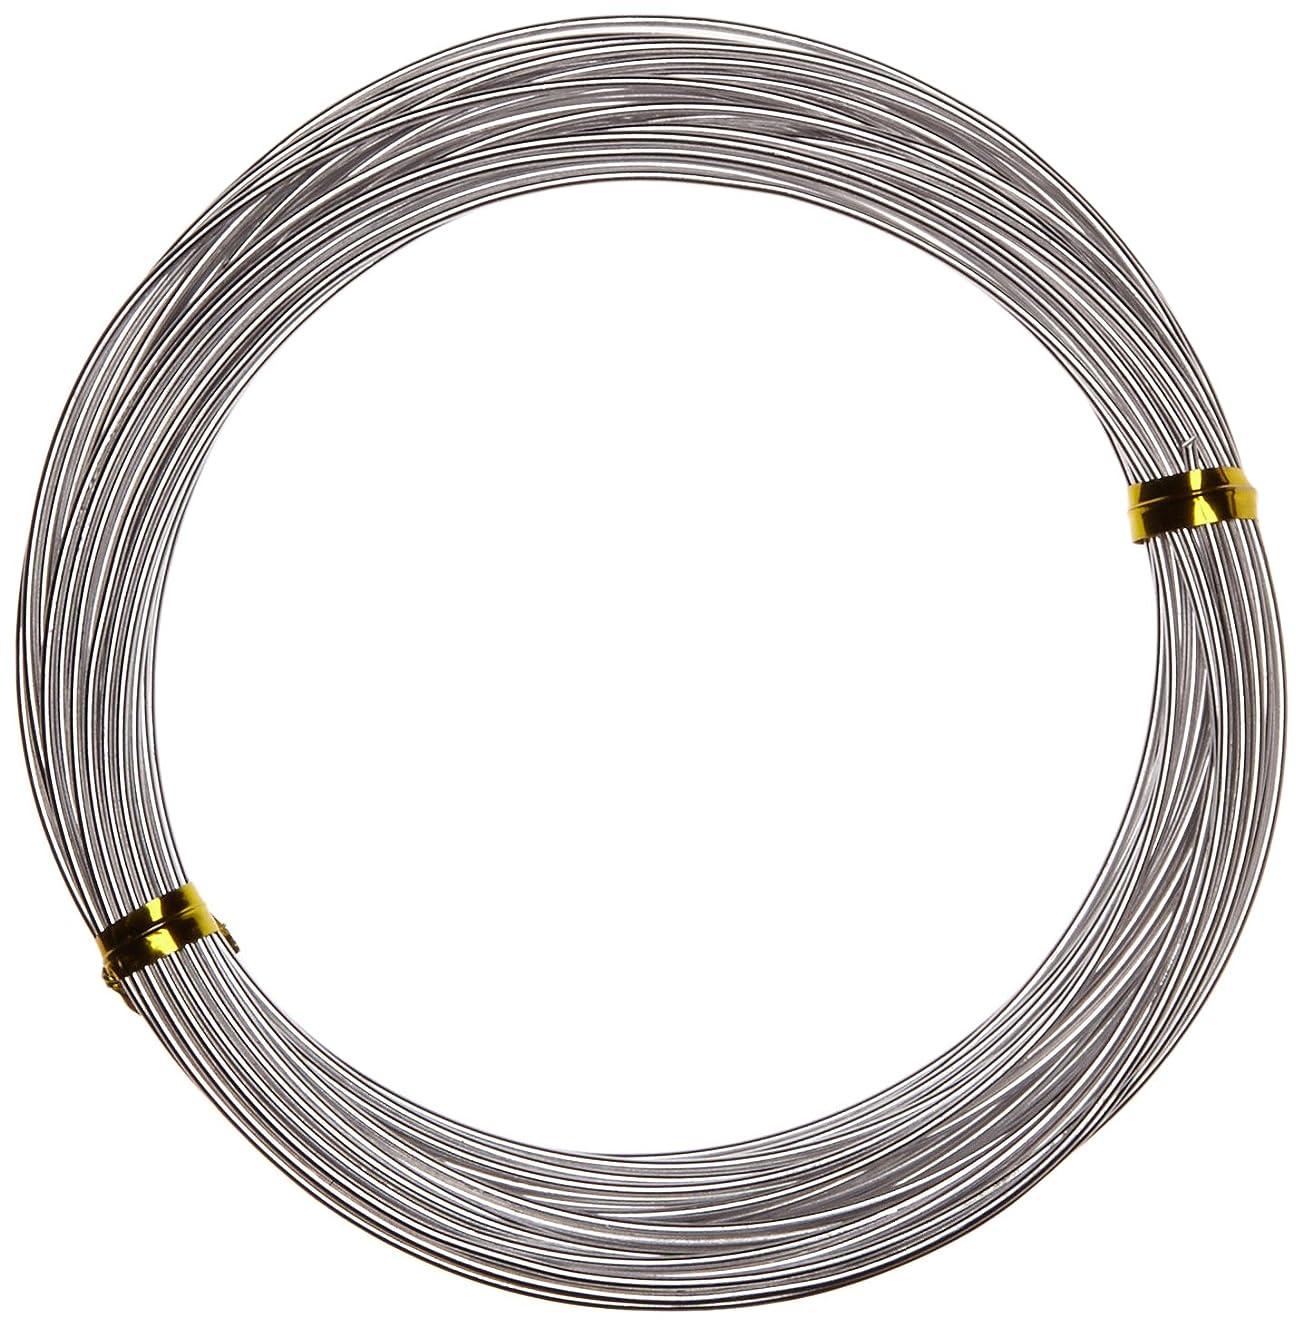 Efco 1 mm x 10 m Aluminium Anodised Round Wire, Silver